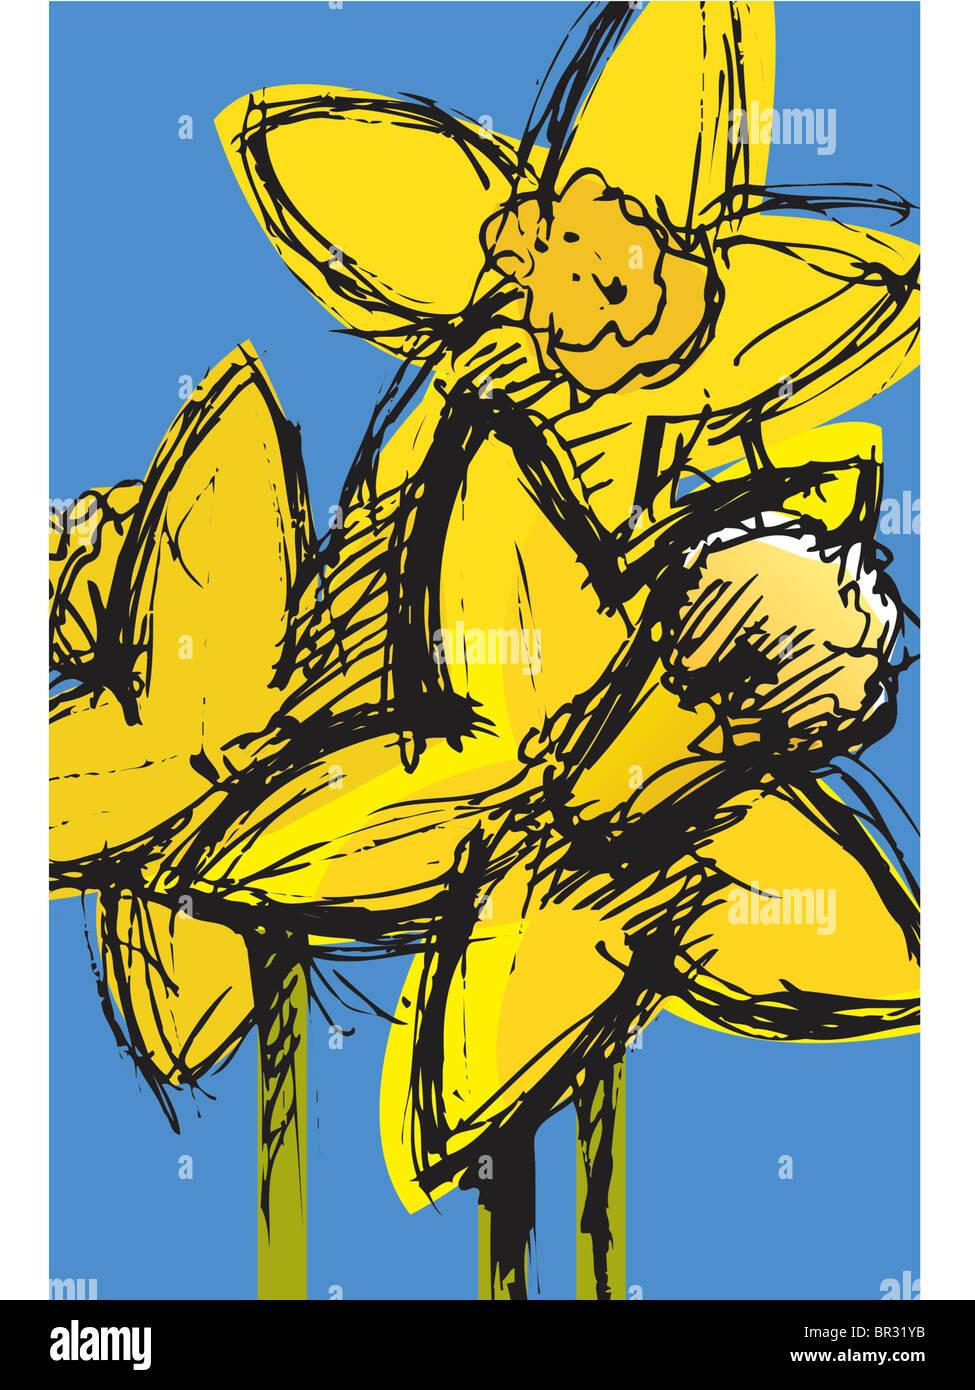 daffodils - Stock Image